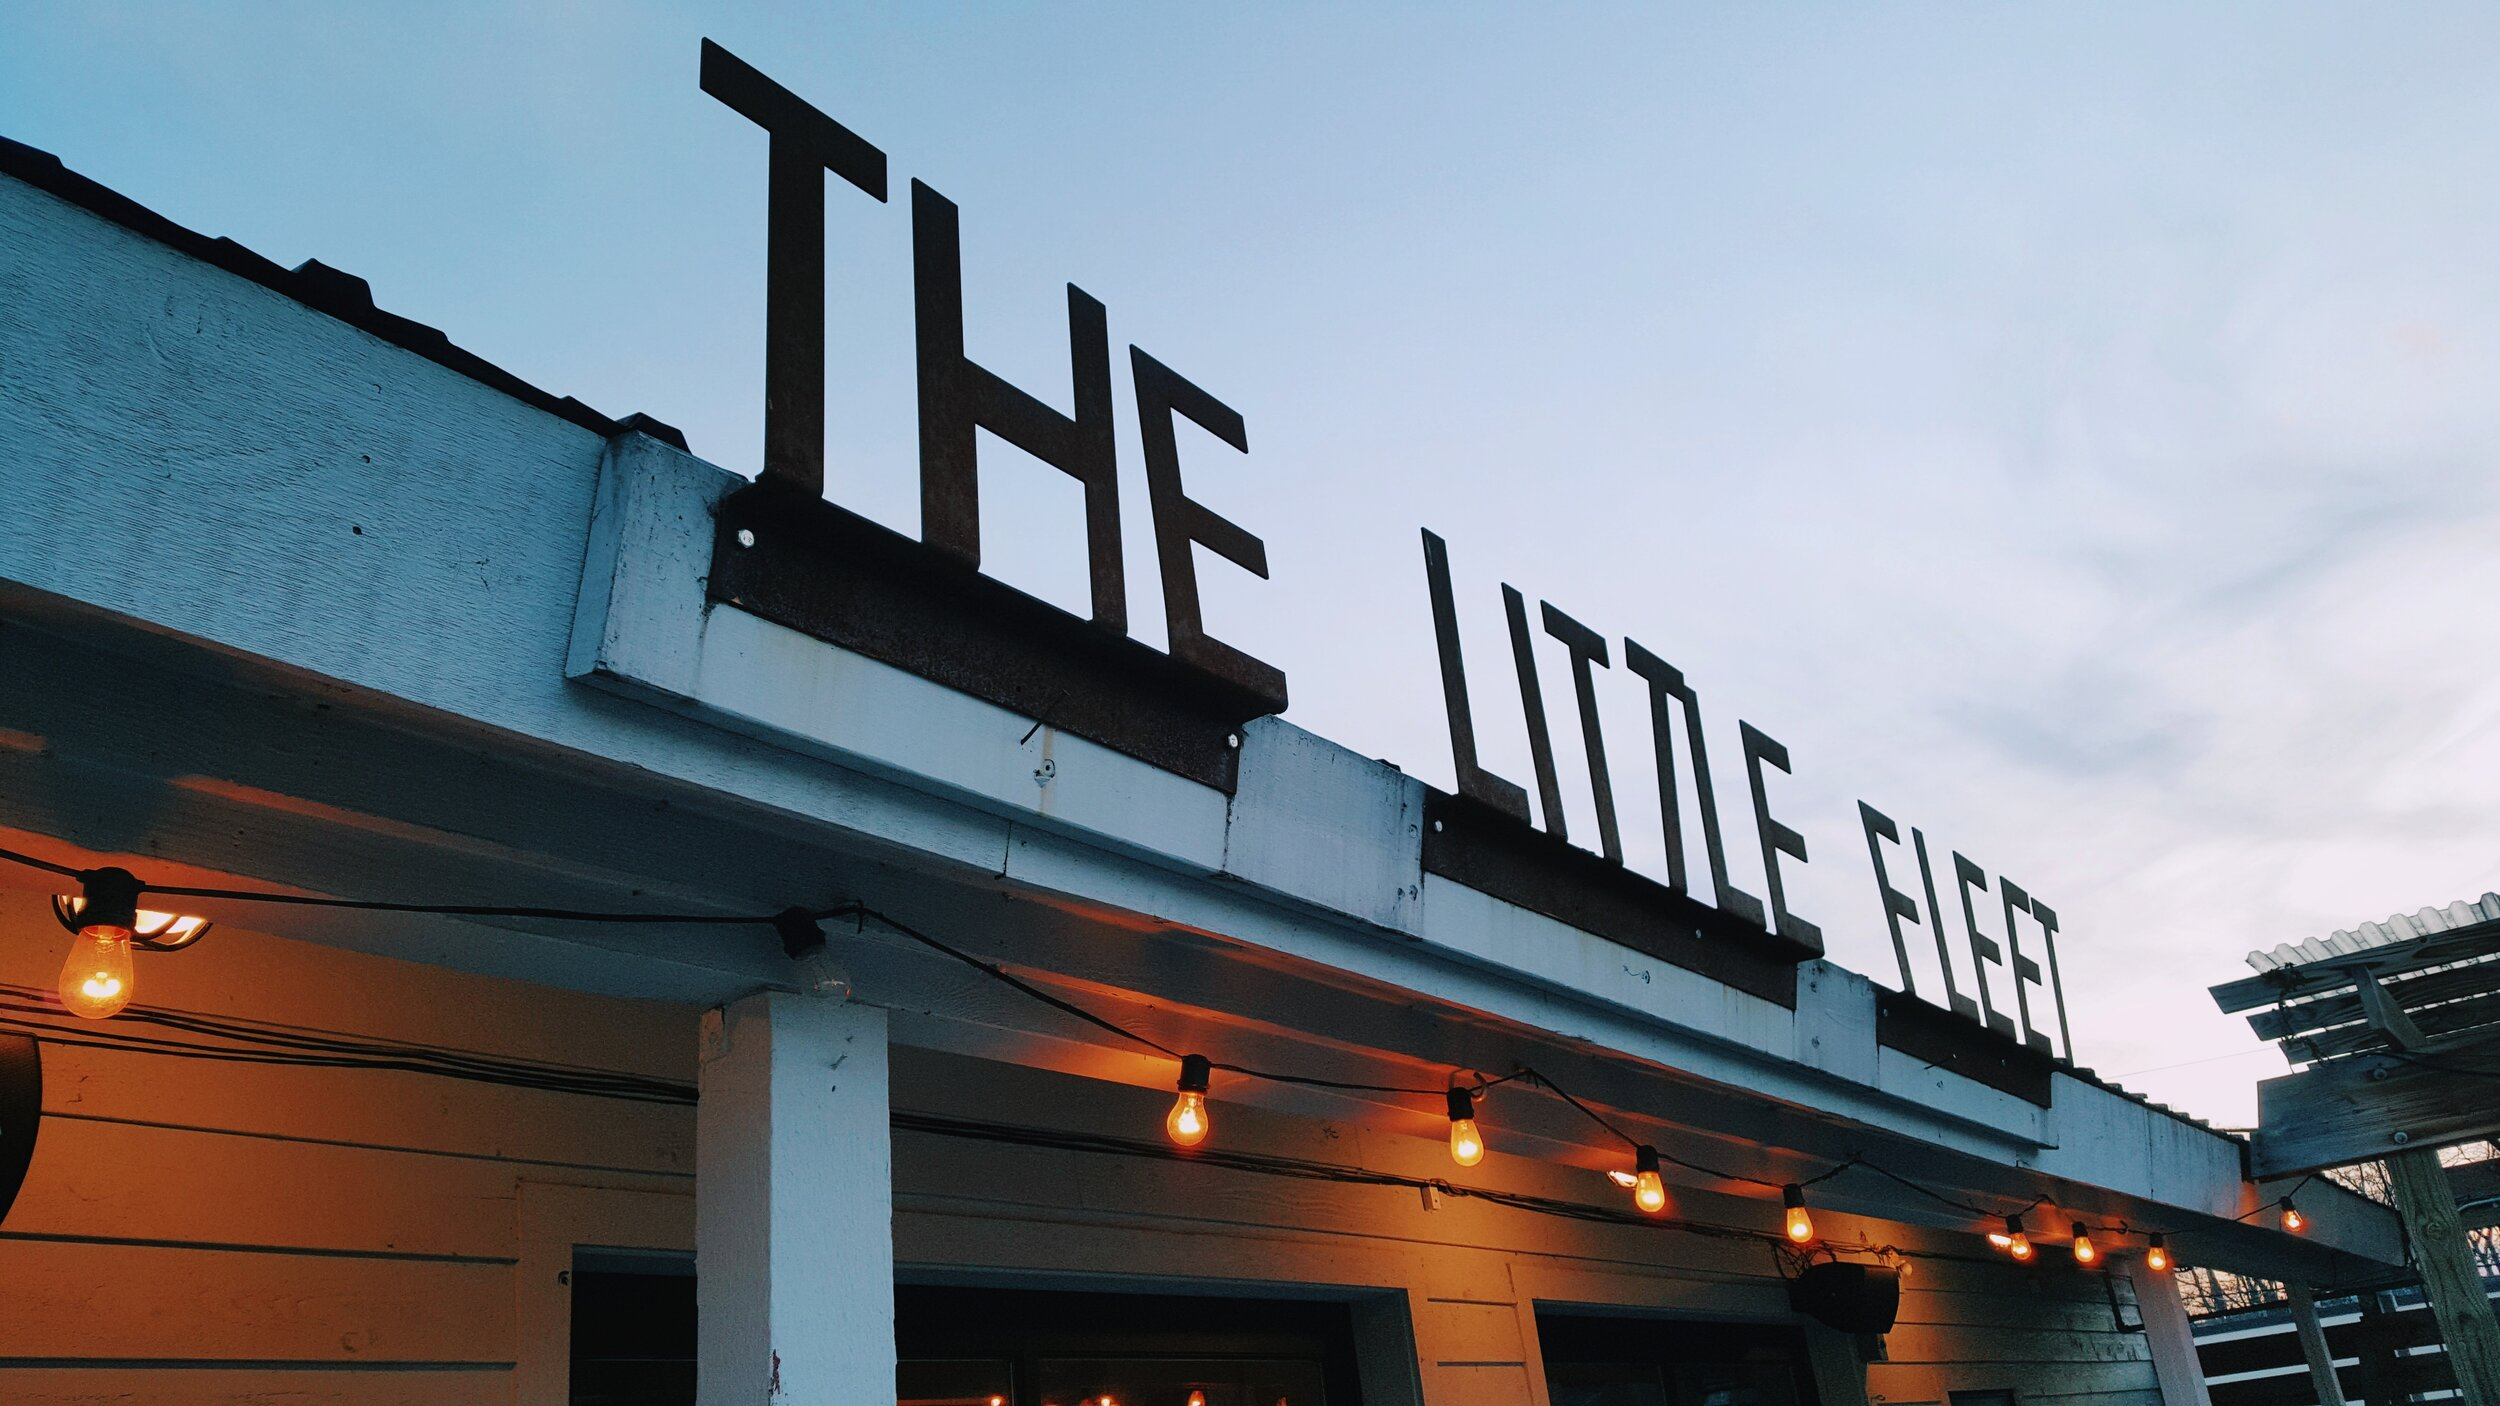 The Little Fleet Restaurant